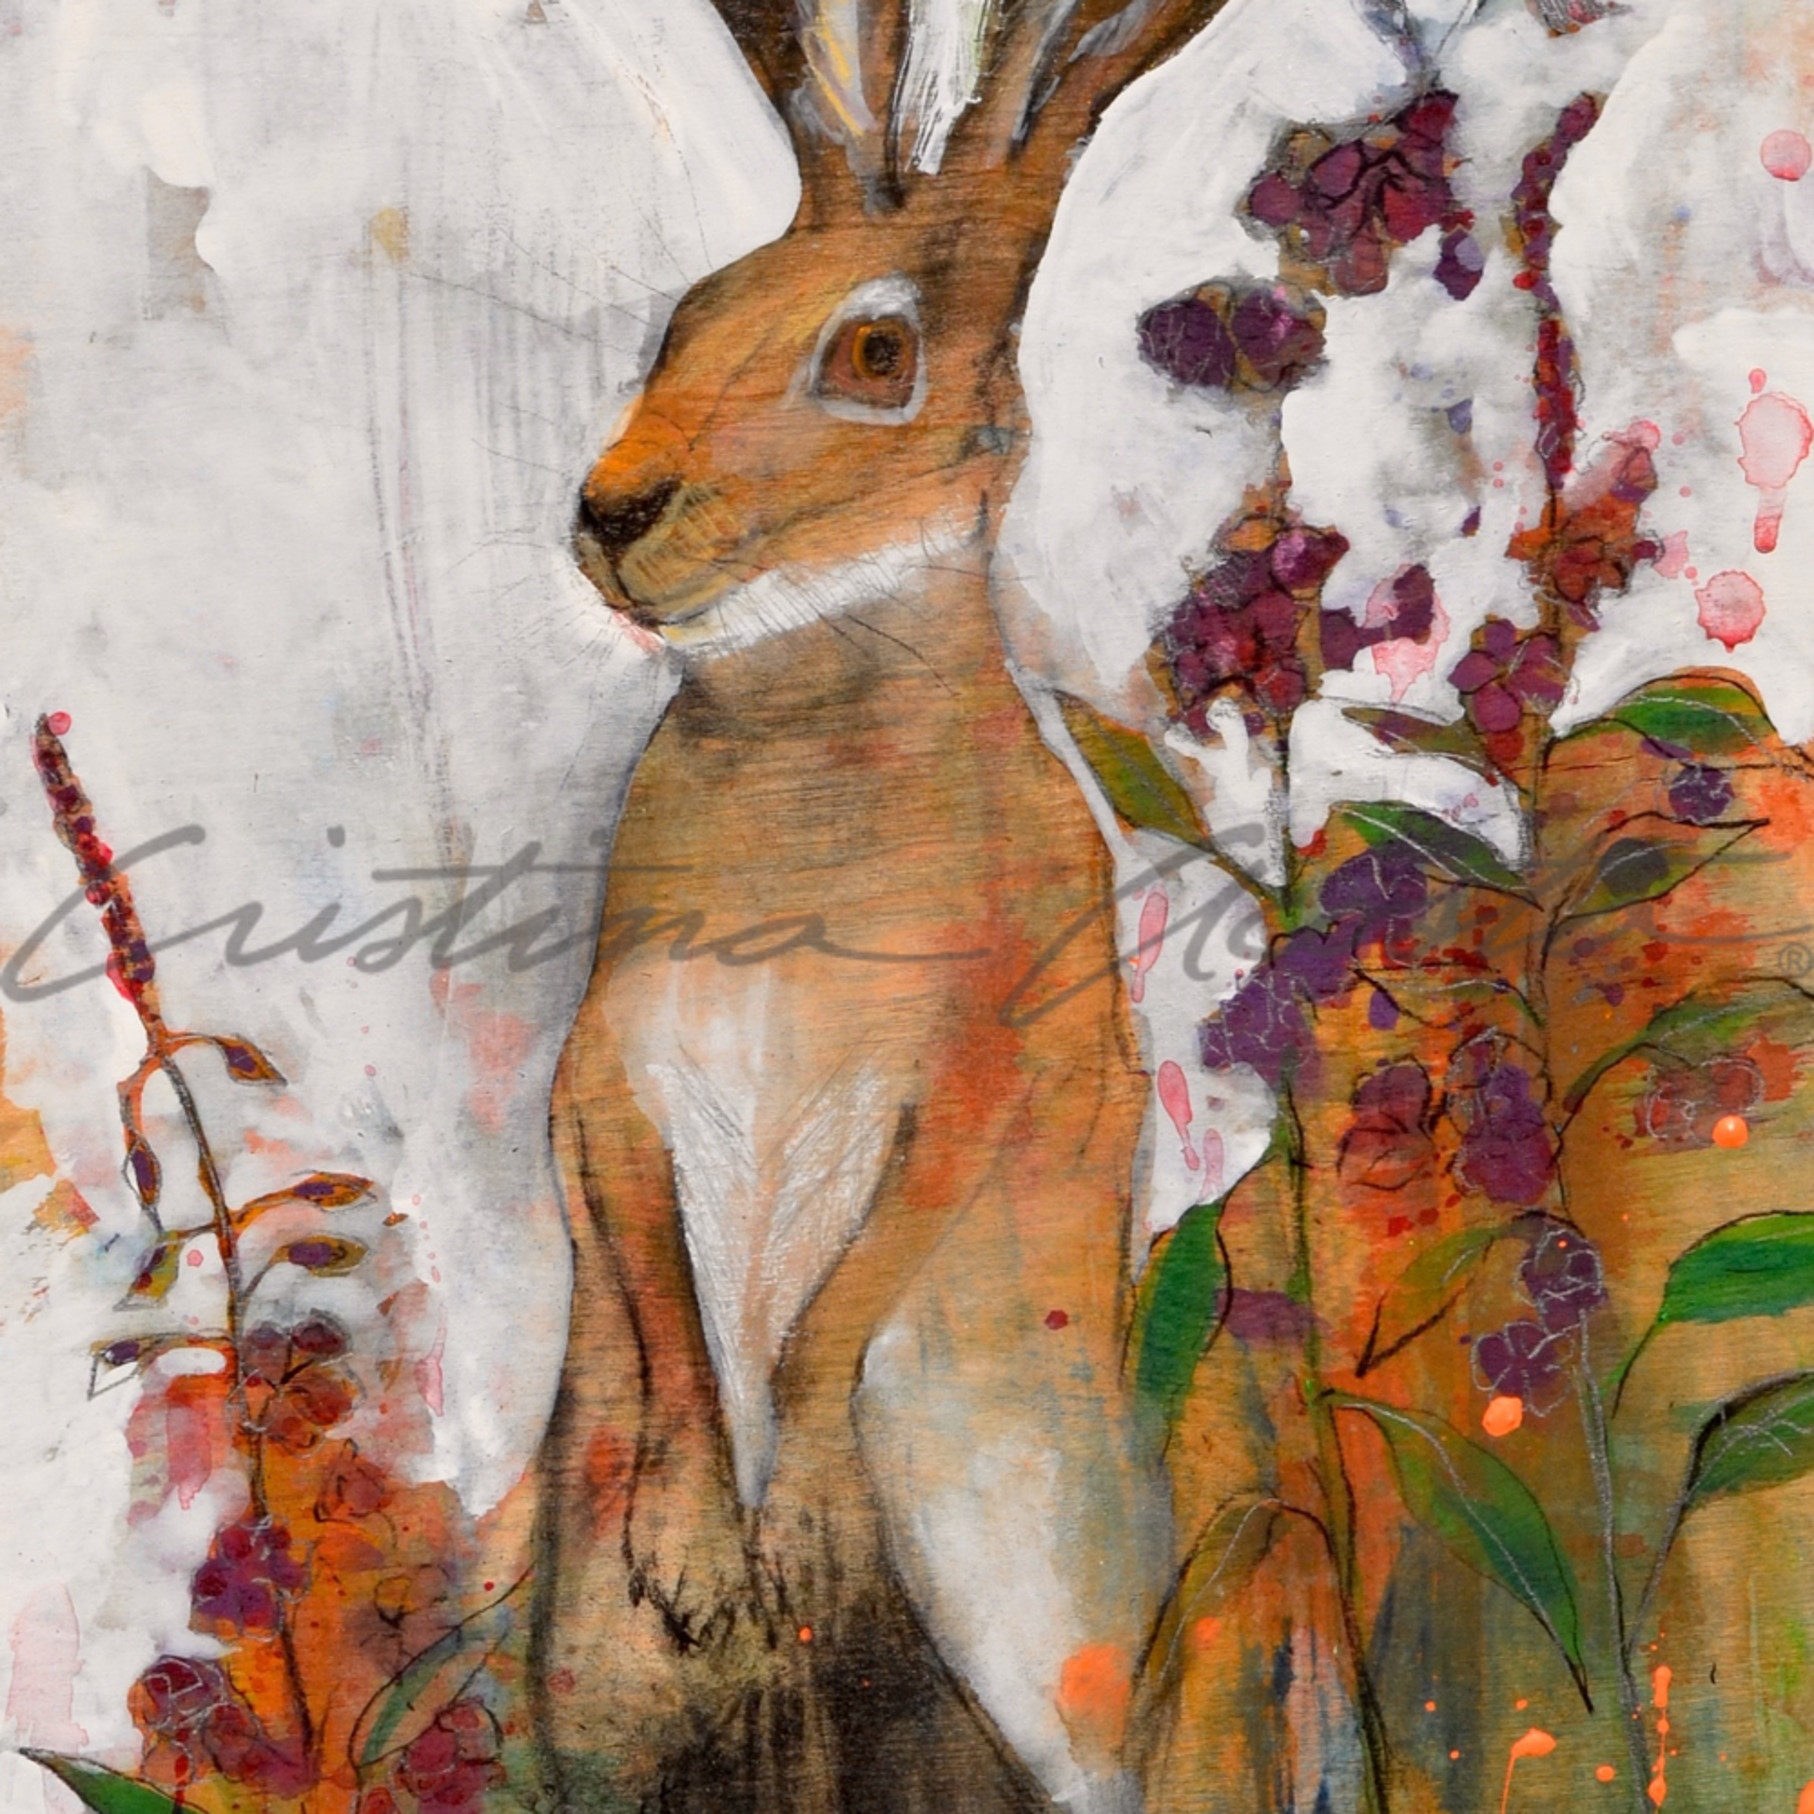 Hare jackrabbit watchful nvp11r